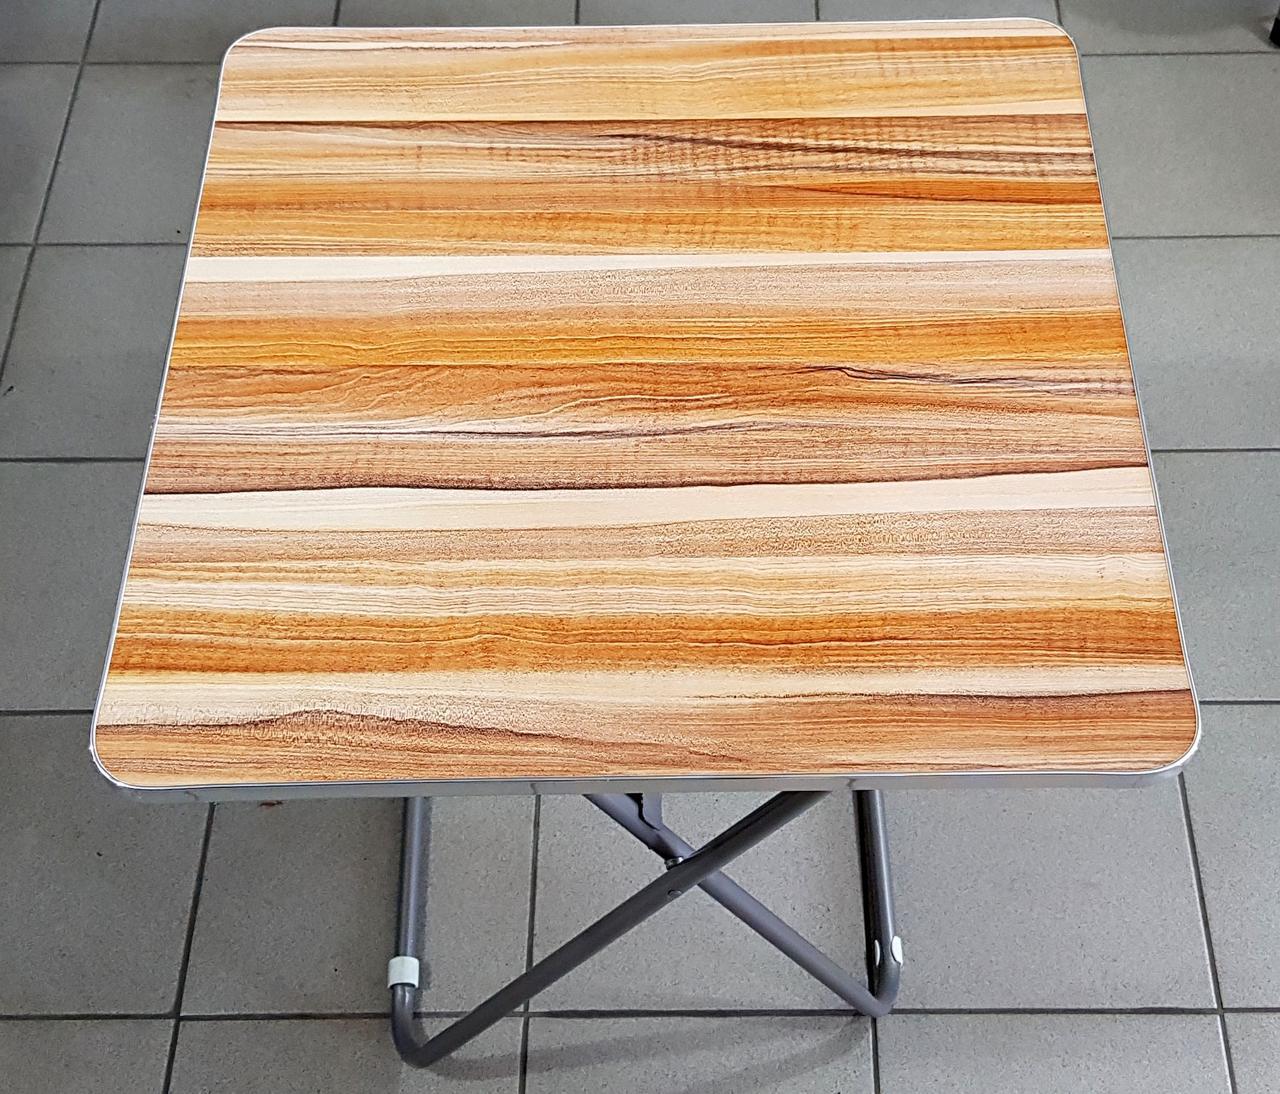 Стол раскладной 60х60, мод-111